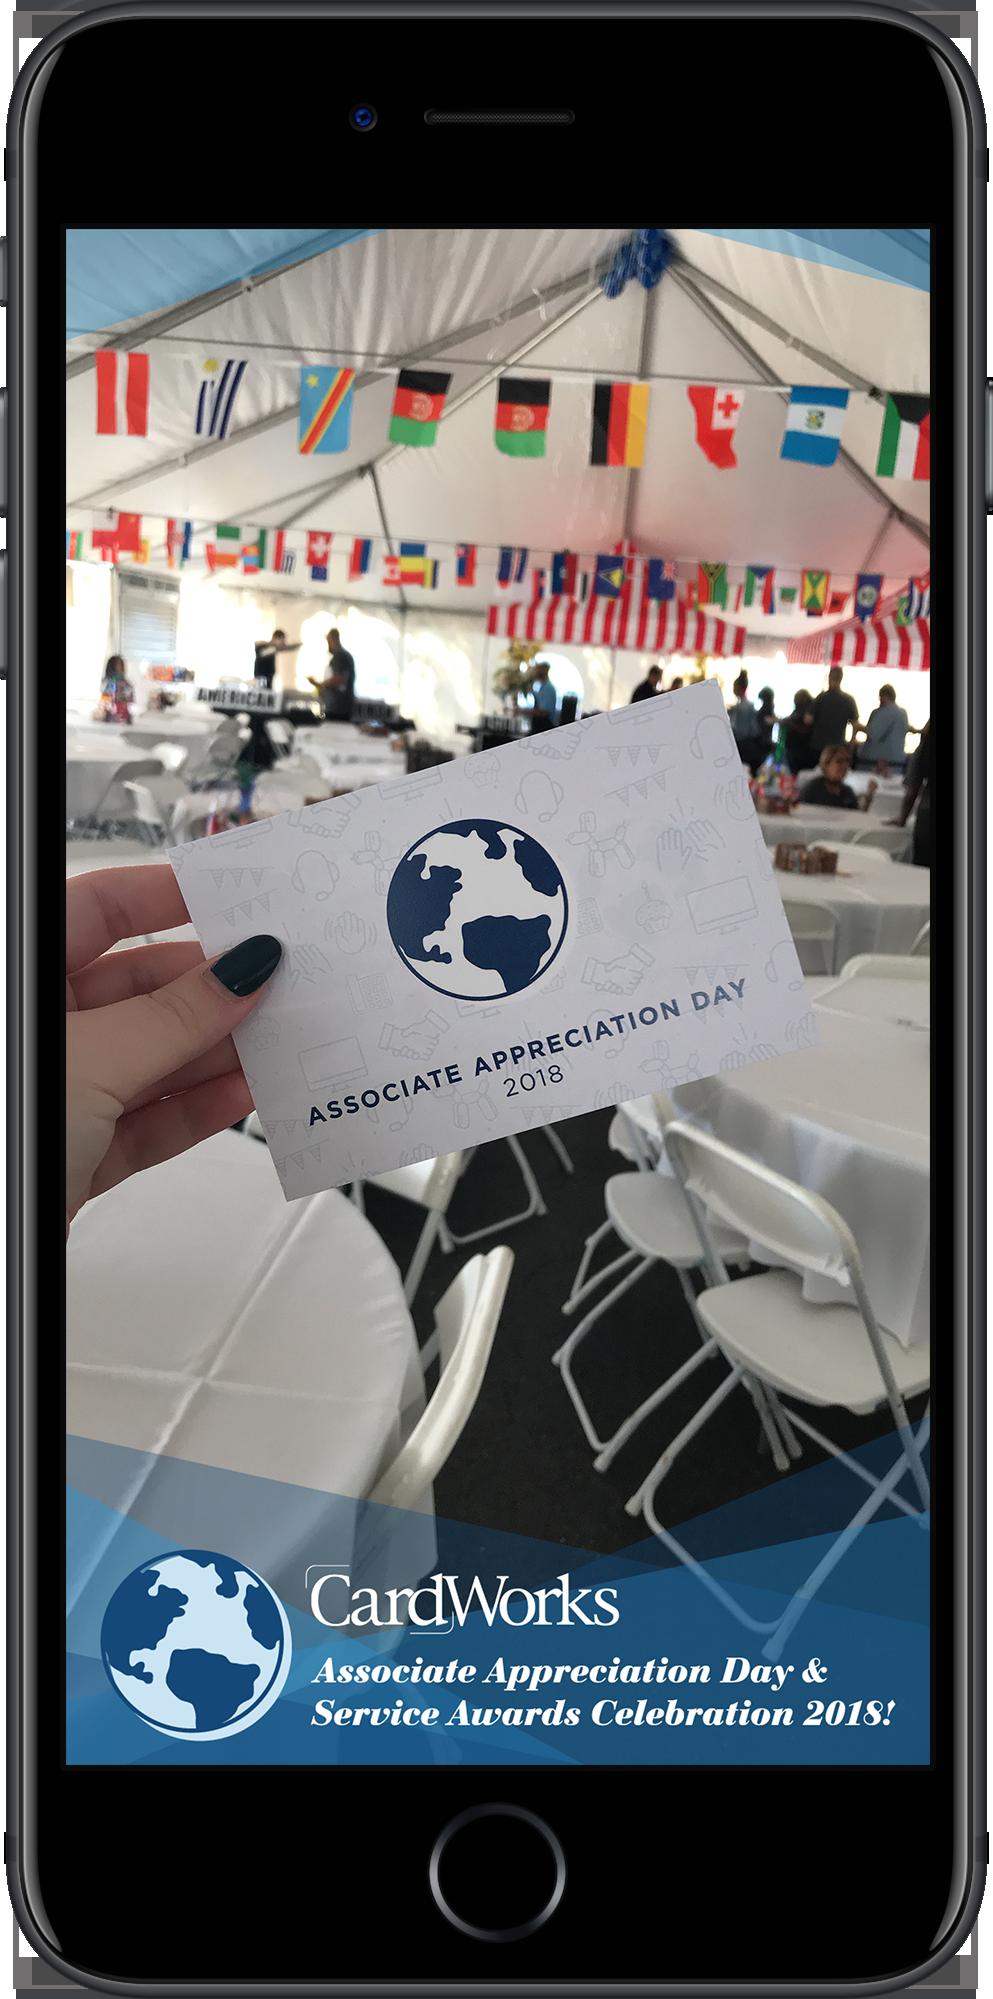 CardWorks Associate Appreciation Day 2018